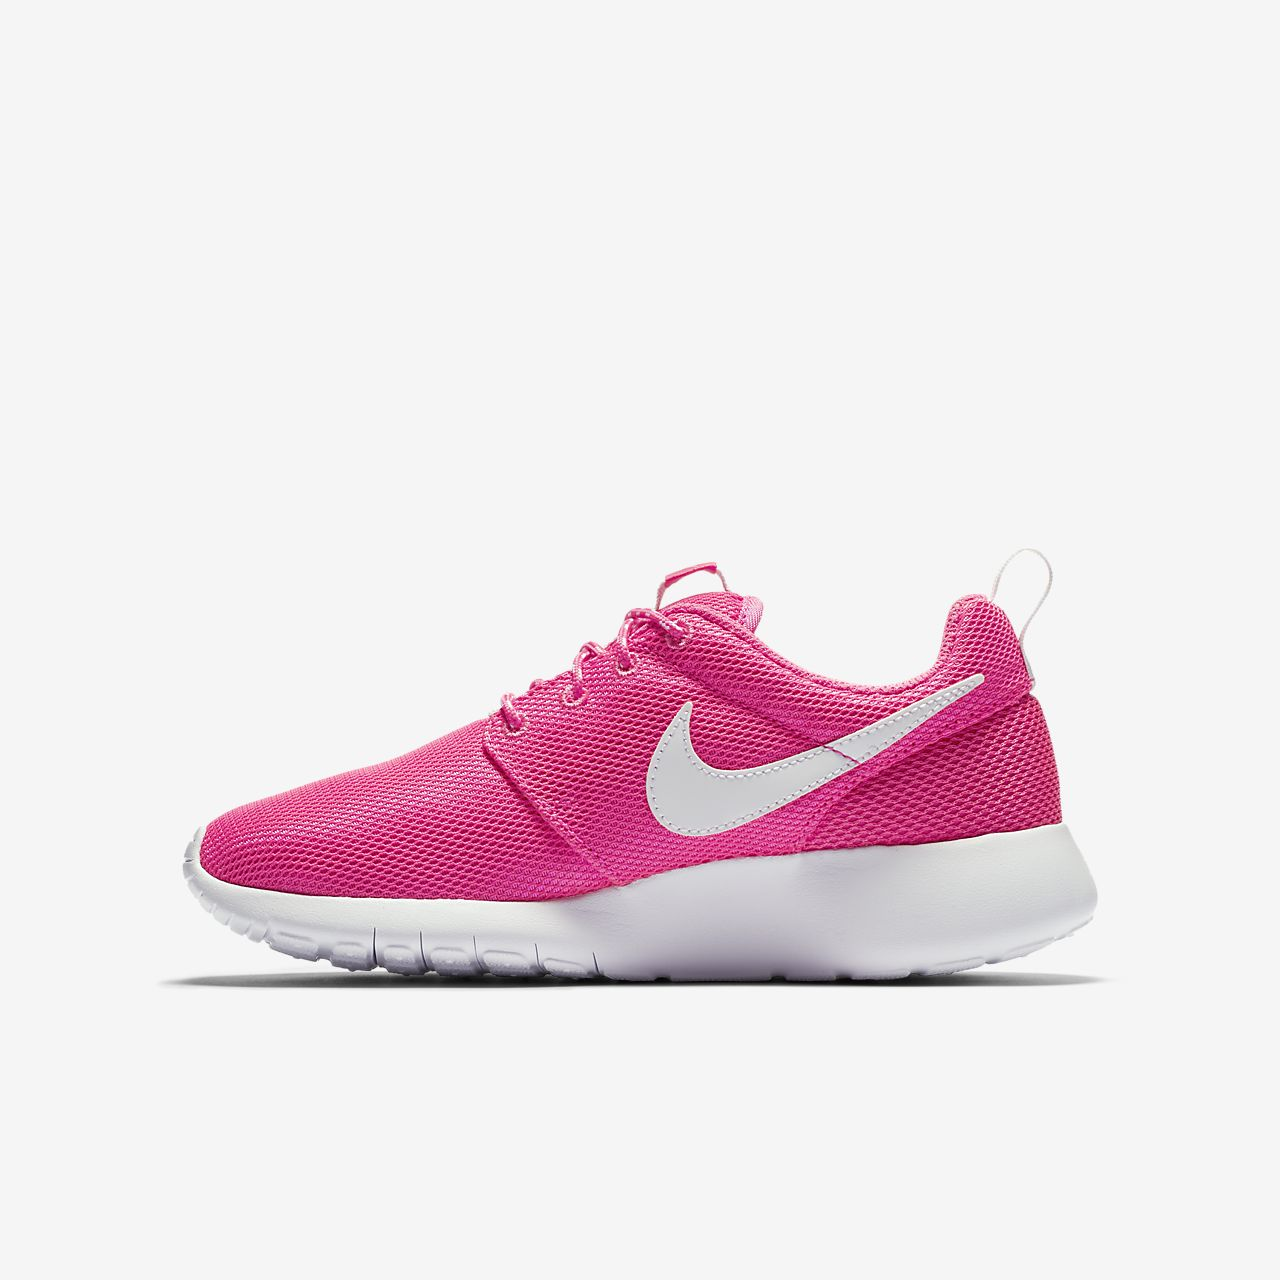 size 40 7863d 98dde ... Sko Nike Roshe One för ungdom